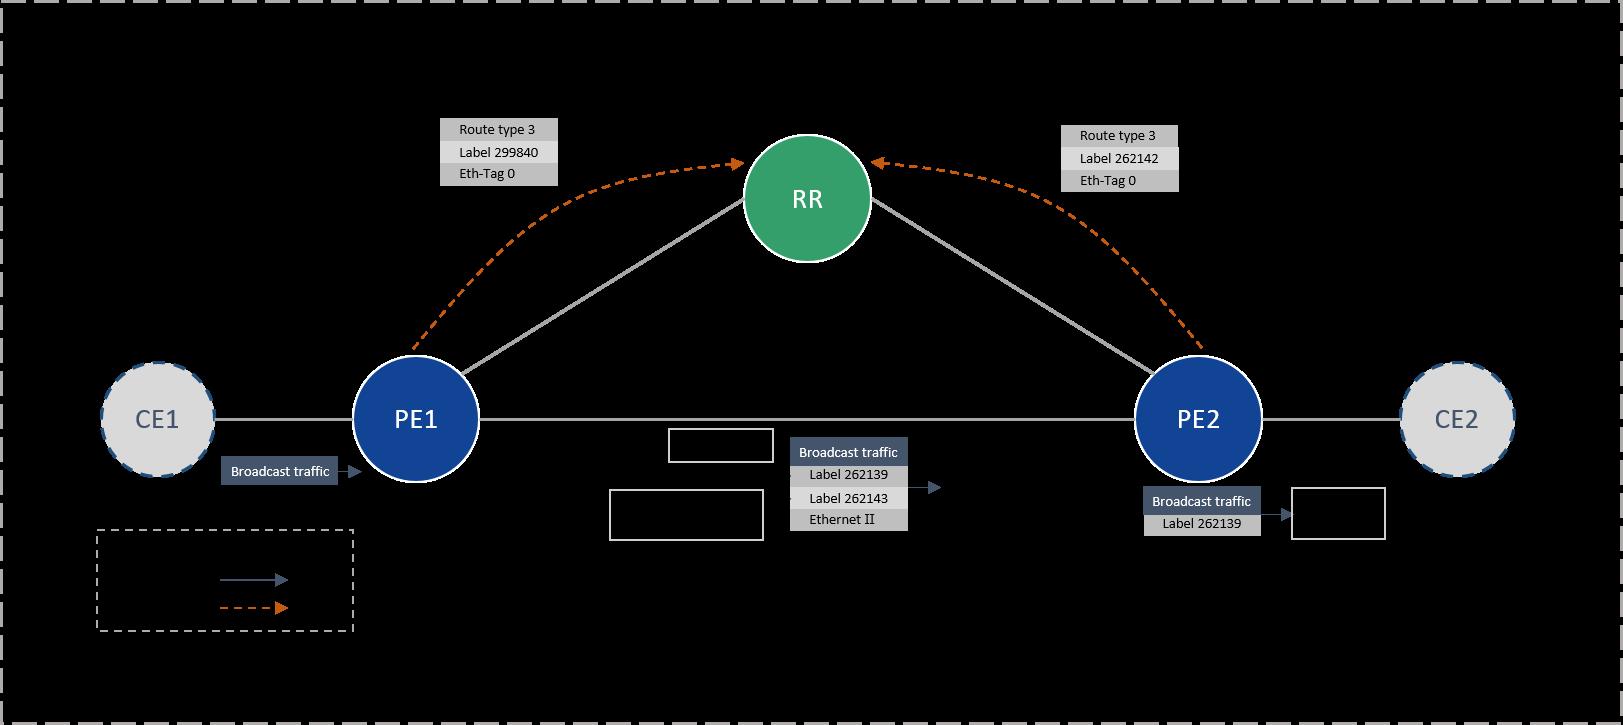 Konfigurasi EVPN MPLS antara Nokia dan Juniper Part 2 - Routecloud